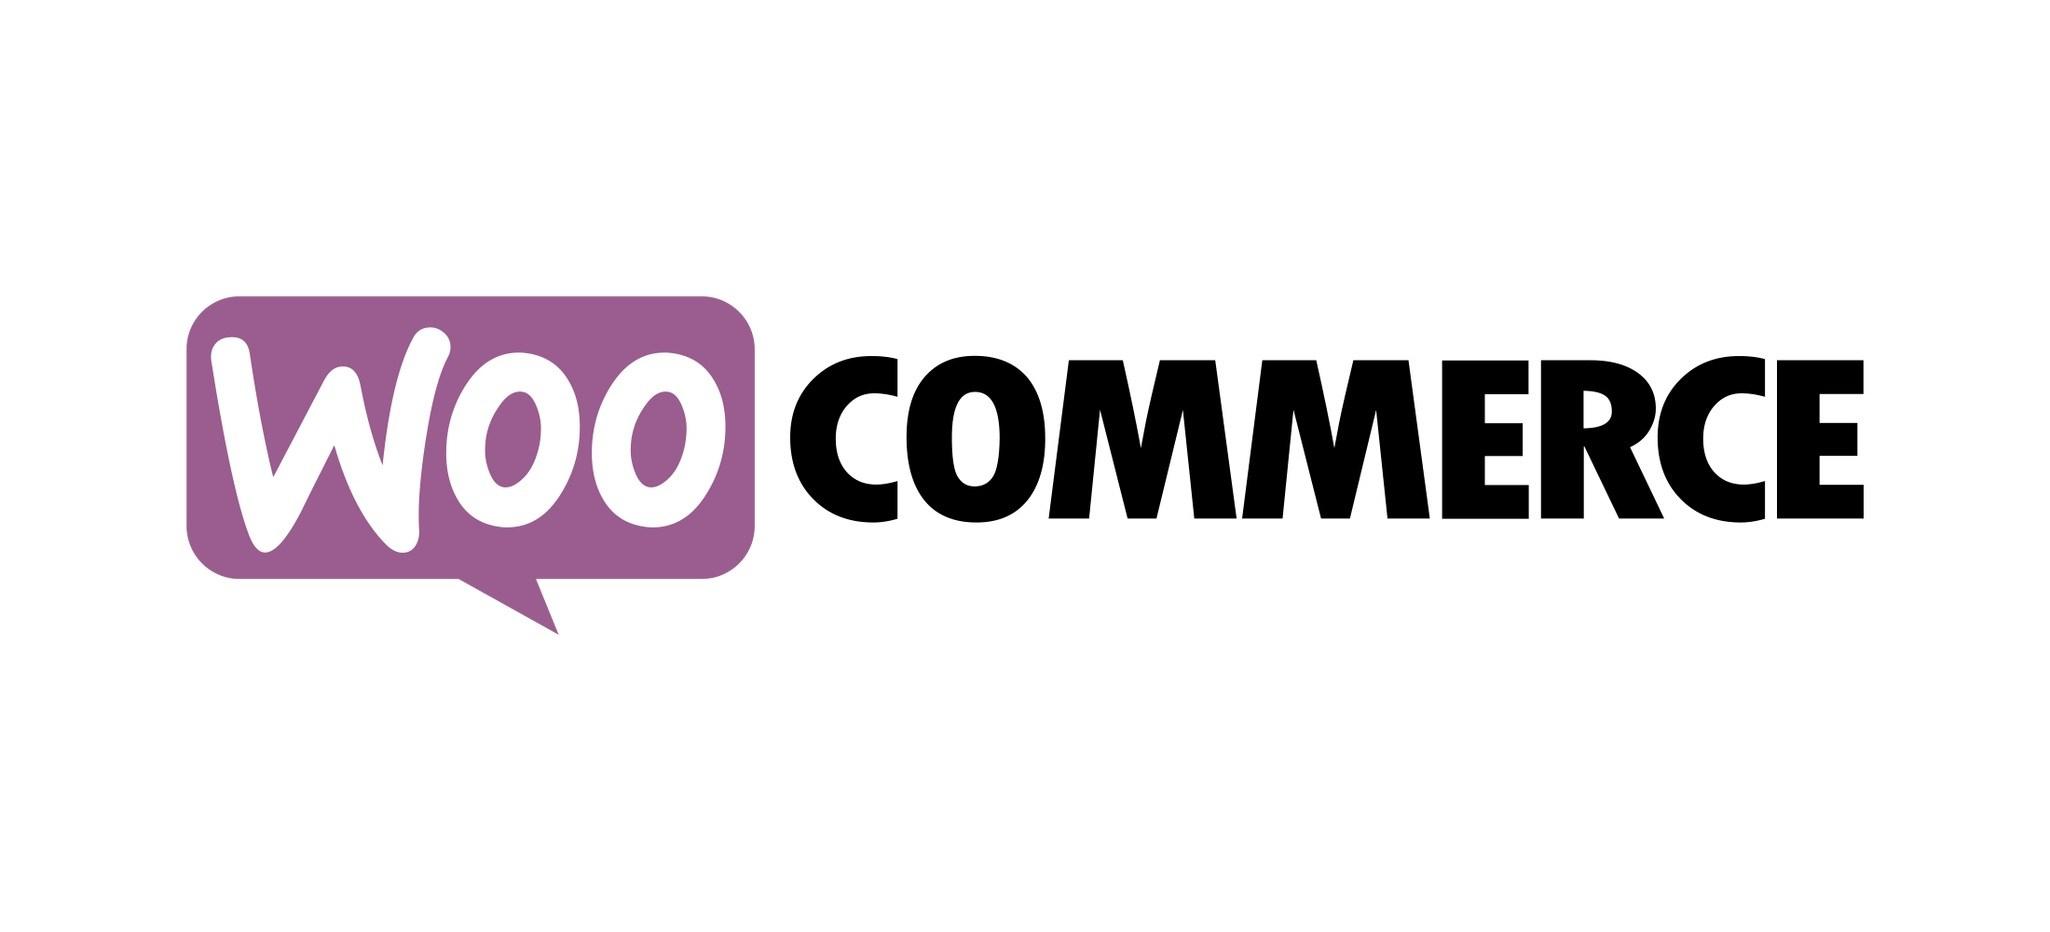 Image result for woocommerce logo